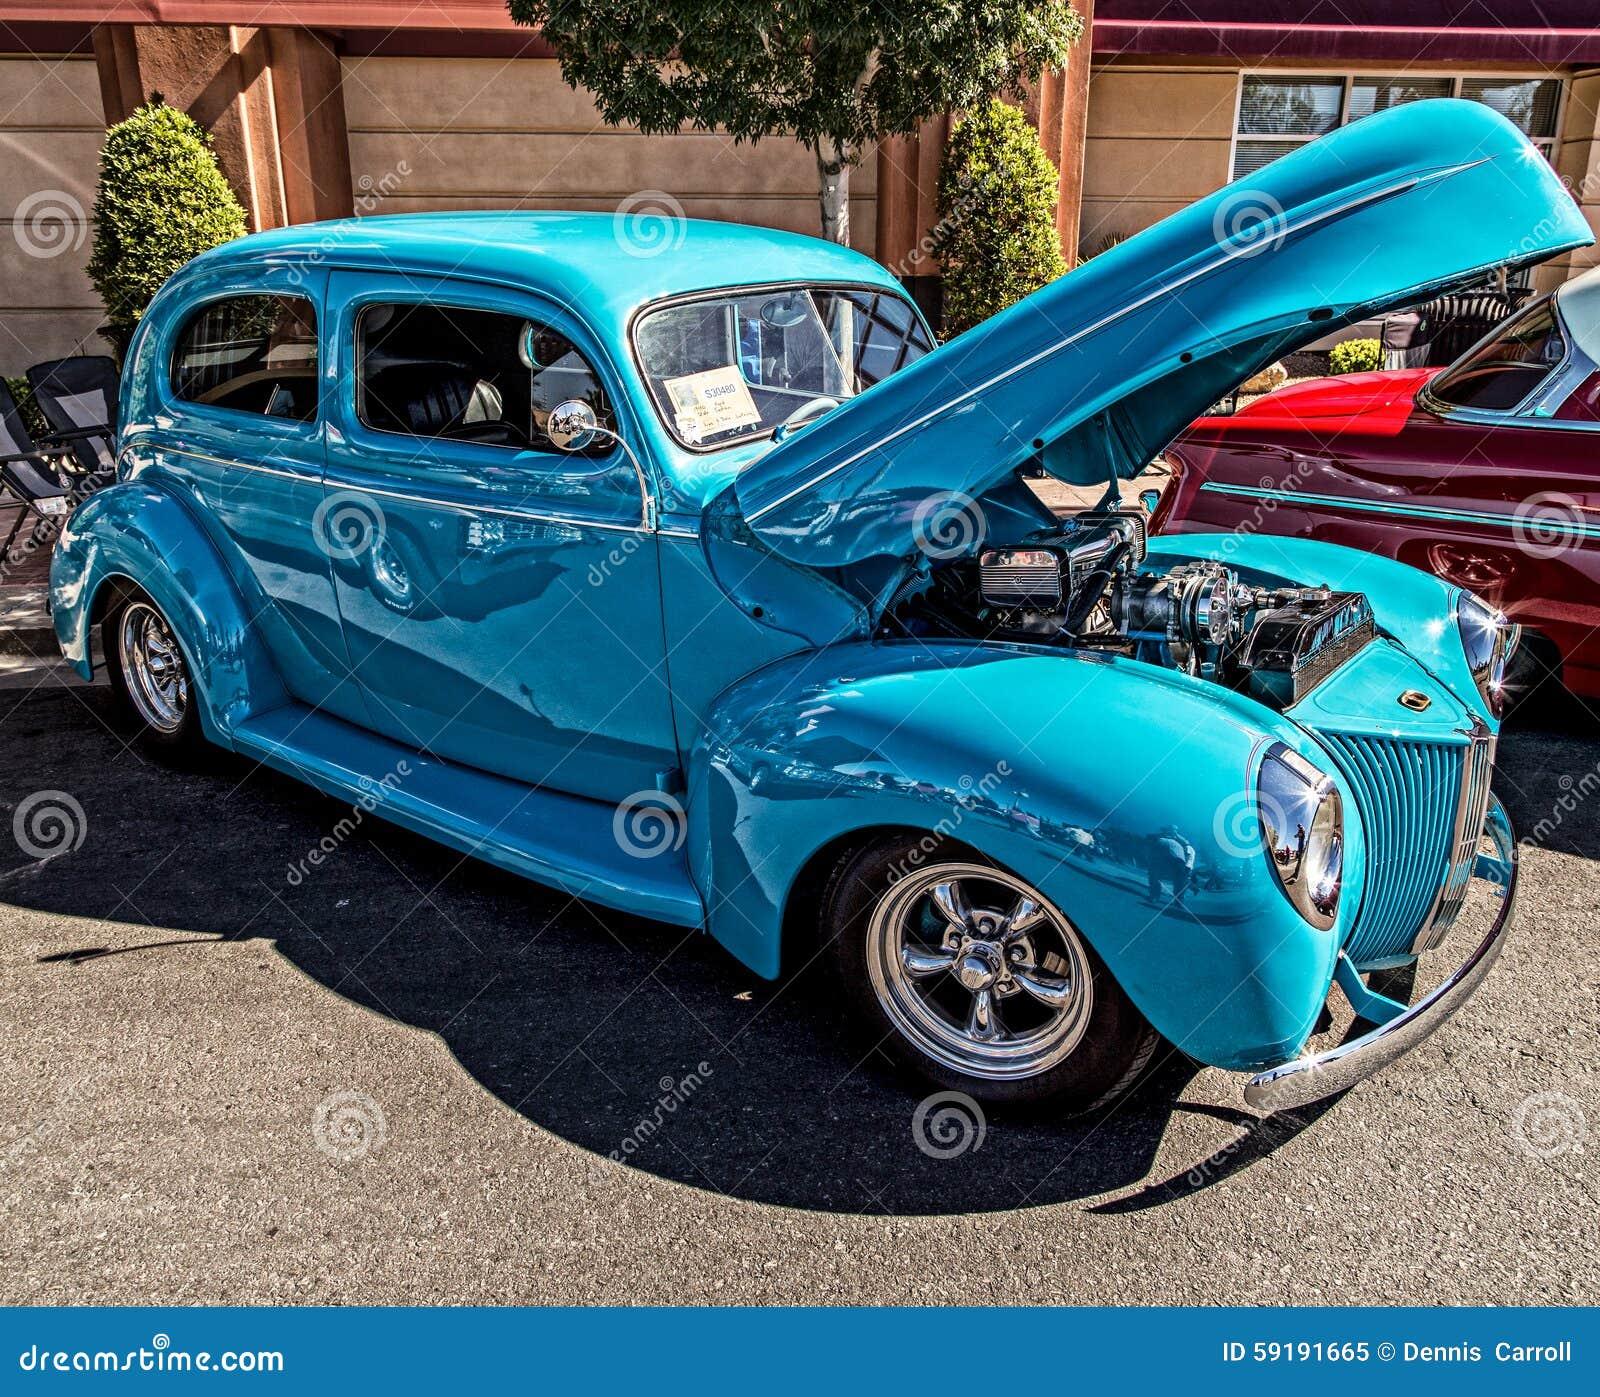 Custom Paint Job Designs Cars